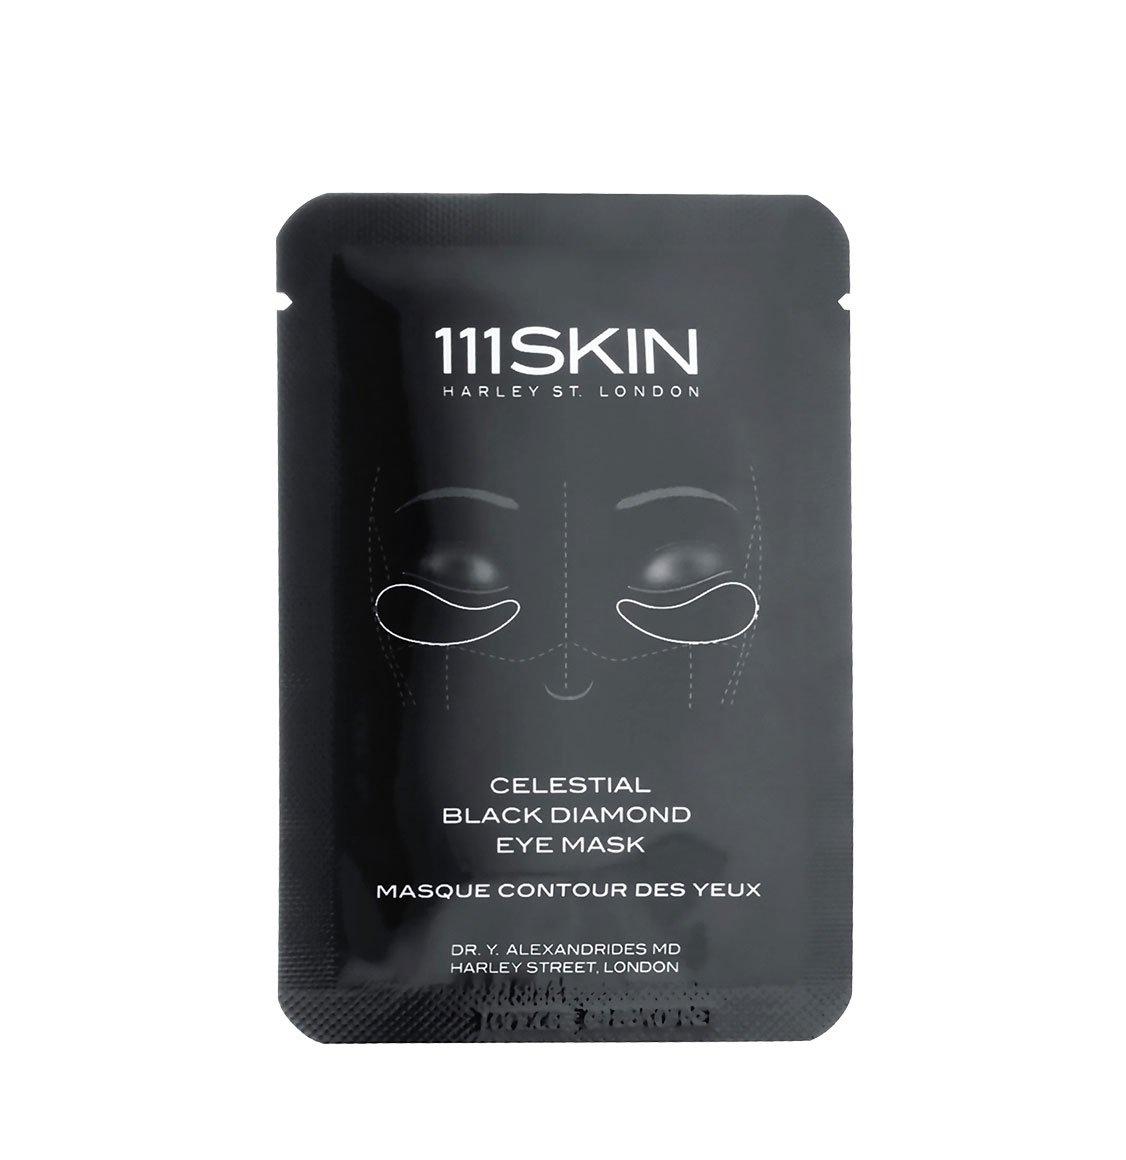 111Skin Celestial Black Diamond Eye Masks Box 8 x 6ml